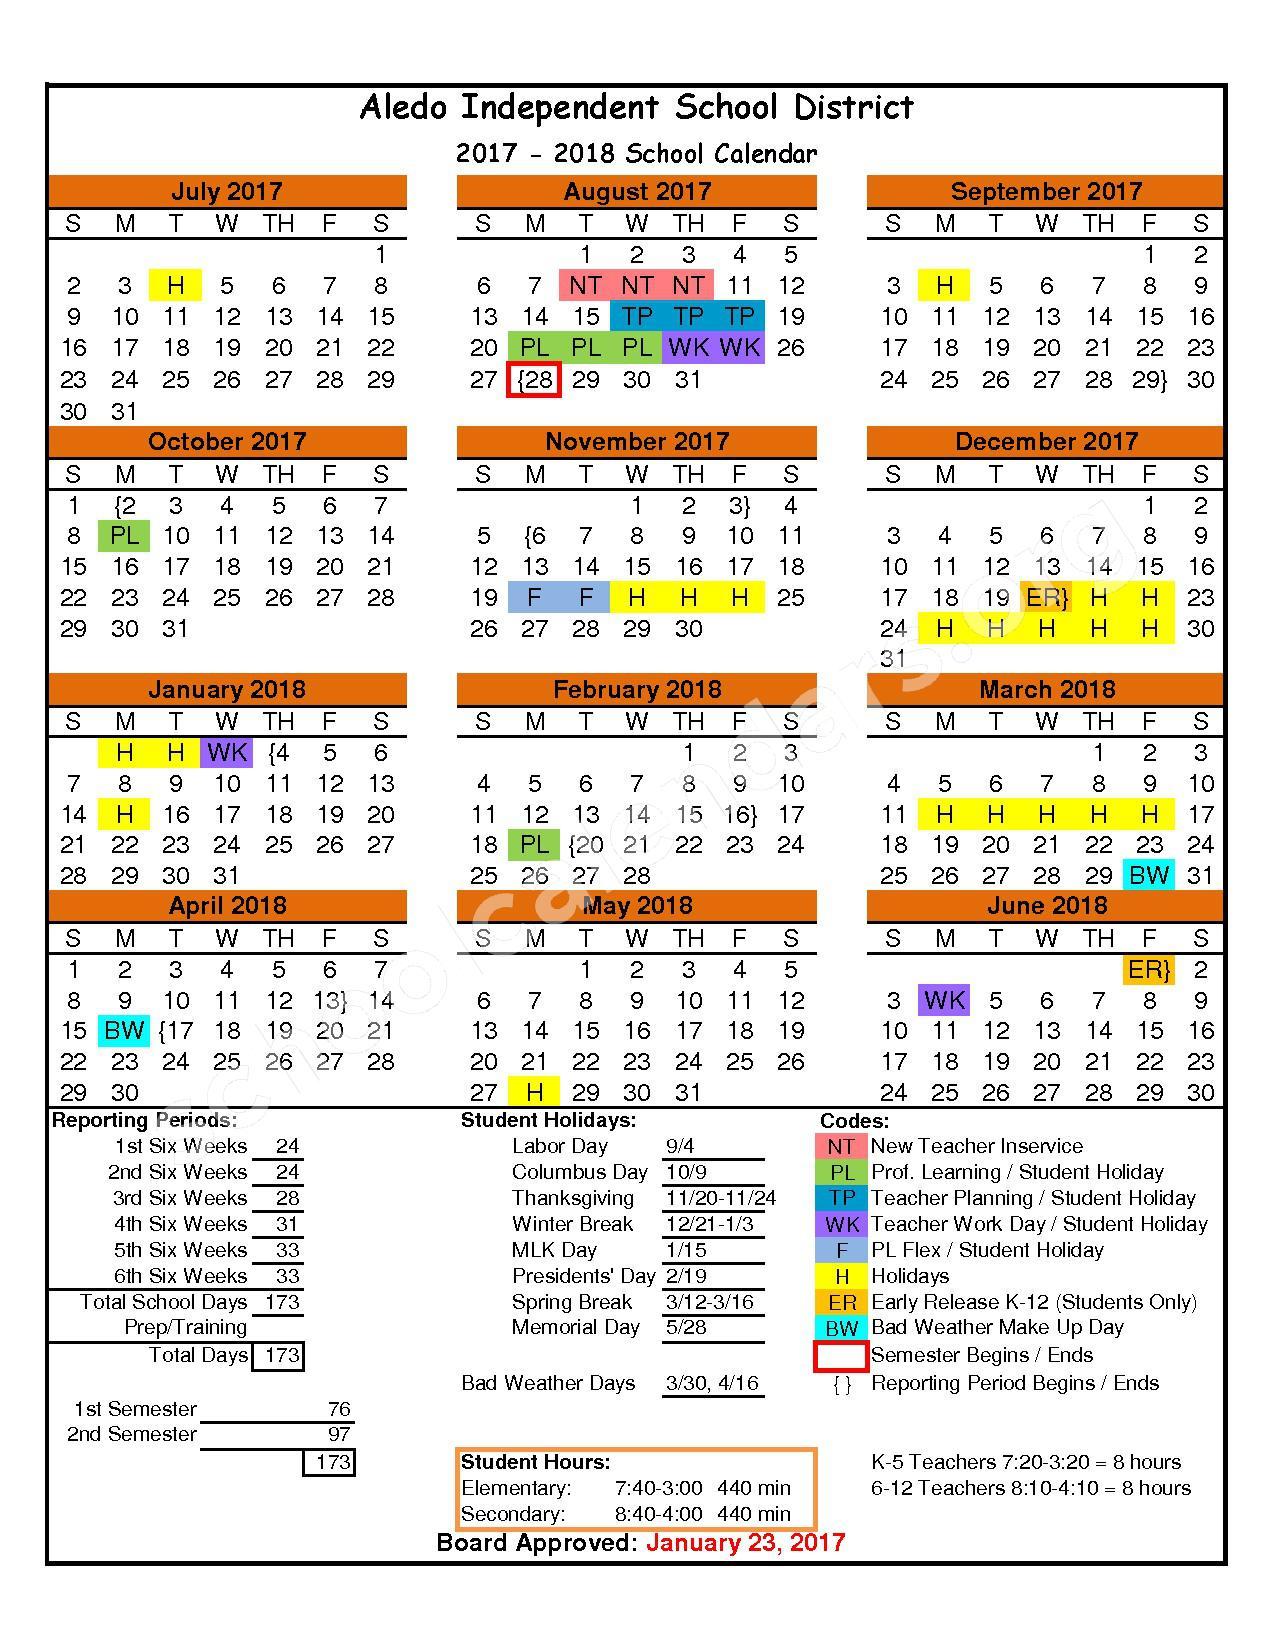 2017 - 2018 District Calendar – Aledo Independent School District – page 1